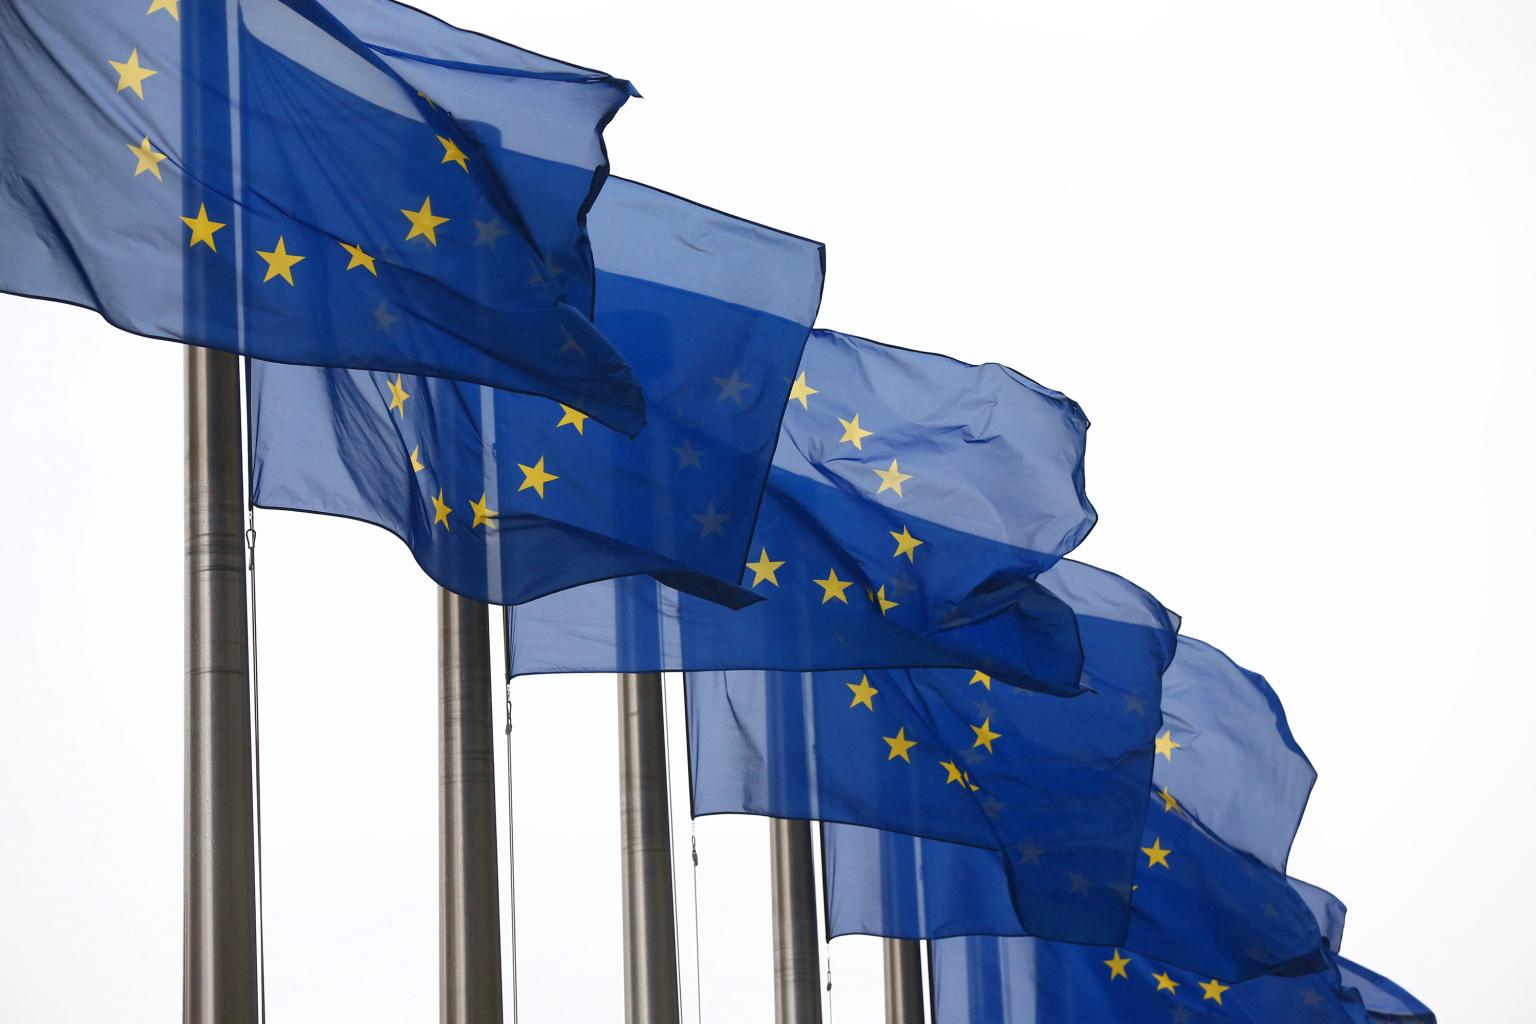 Se poi davvero fosse Italexit?